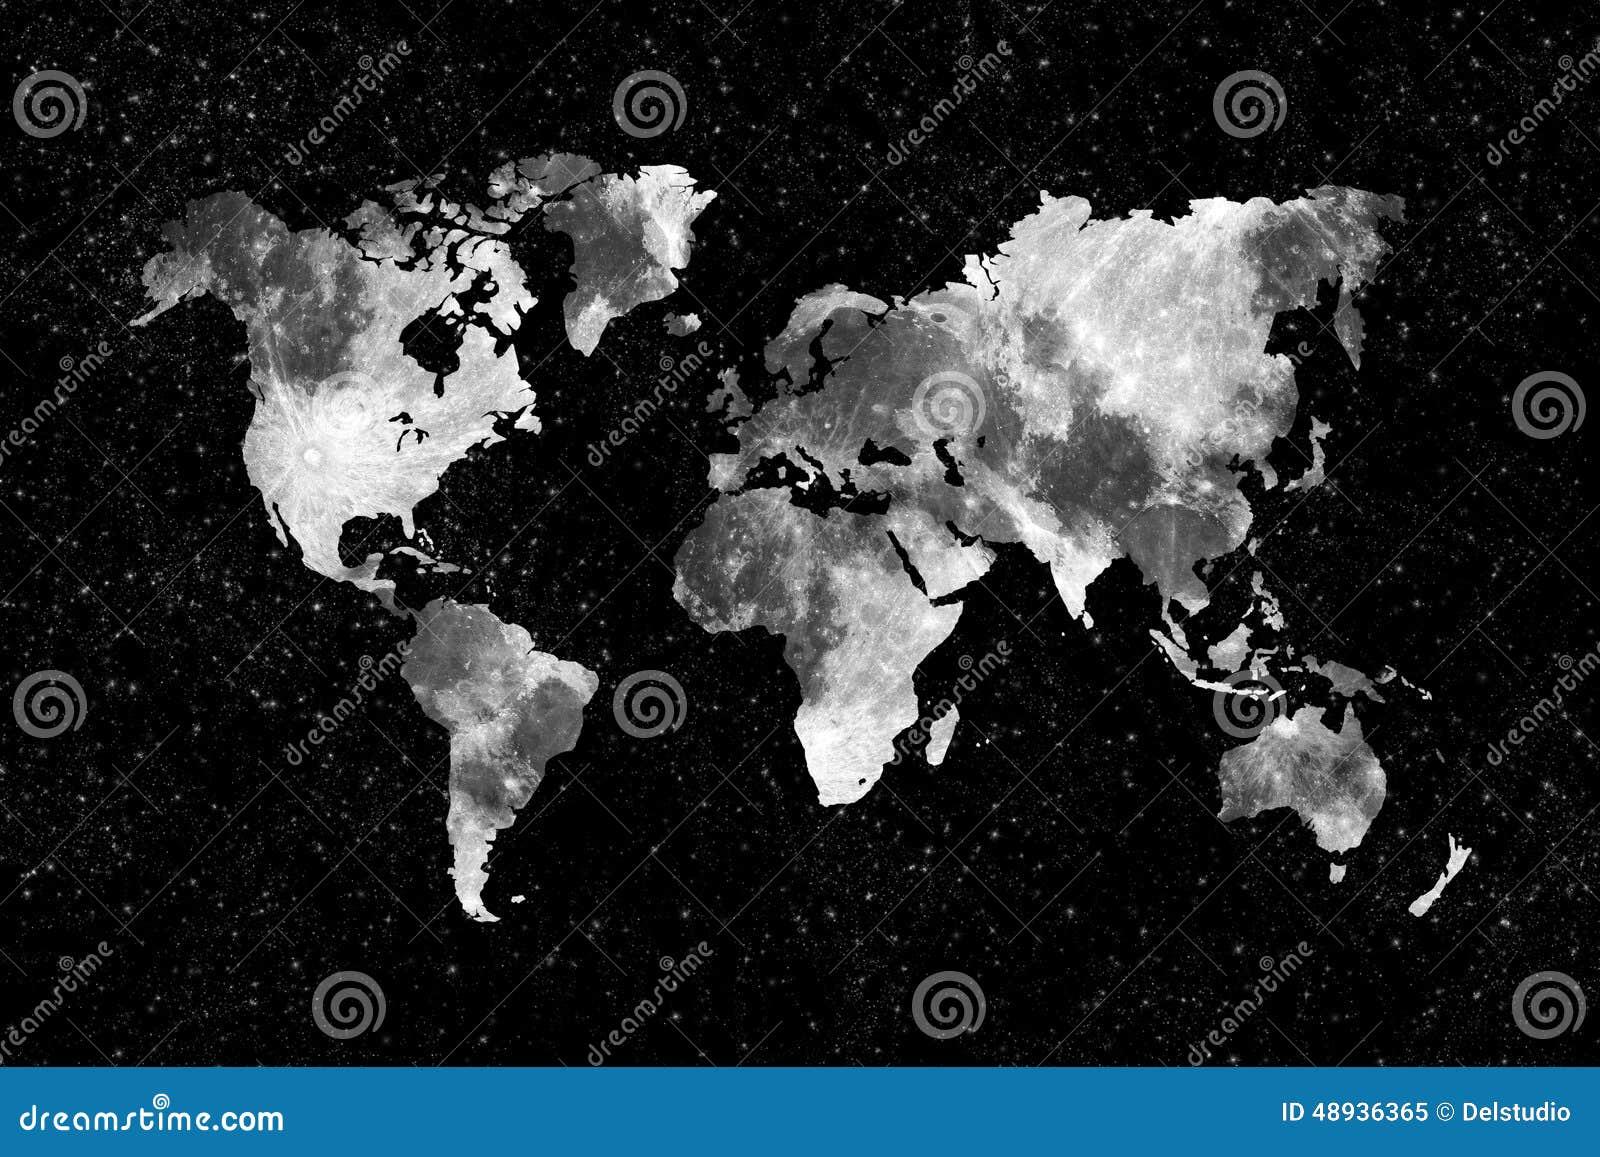 Moon world map stock image. Image of astronomy, surrealist - 48936365